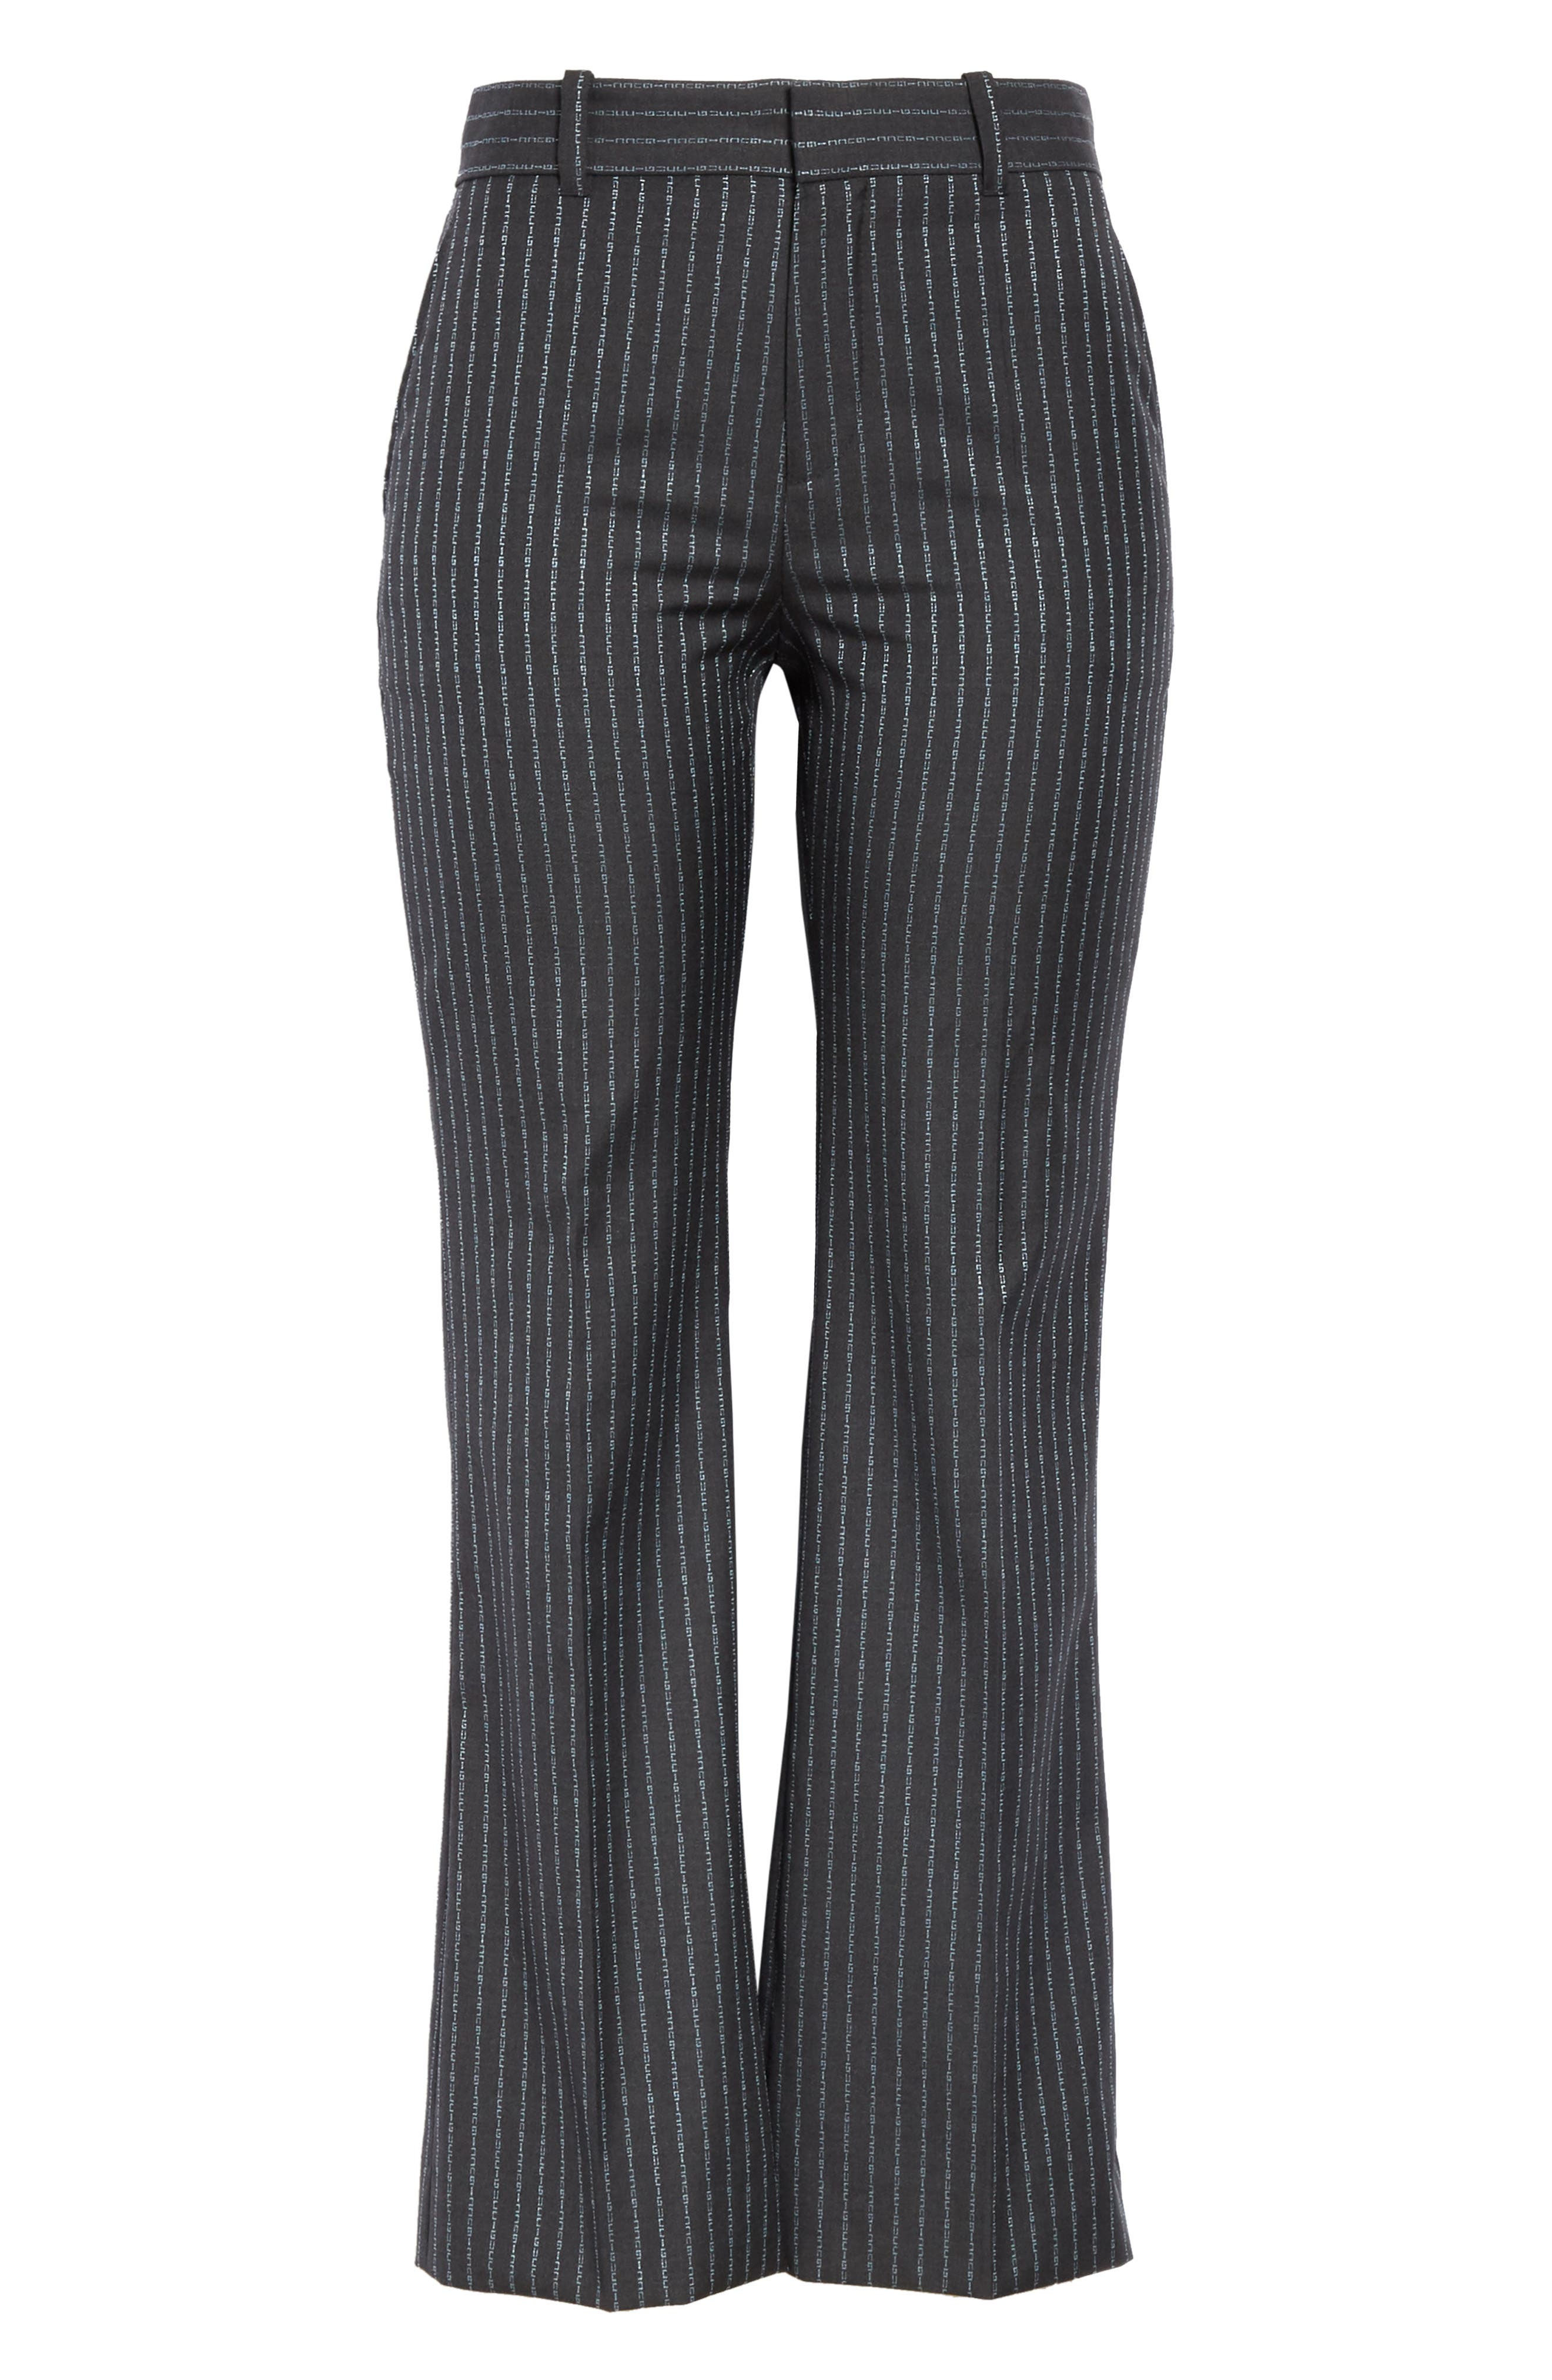 GUCCI,                             Gucci Stripe Bootcut Pants,                             Alternate thumbnail 3, color,                             1180 DARK GREY/ AZURE